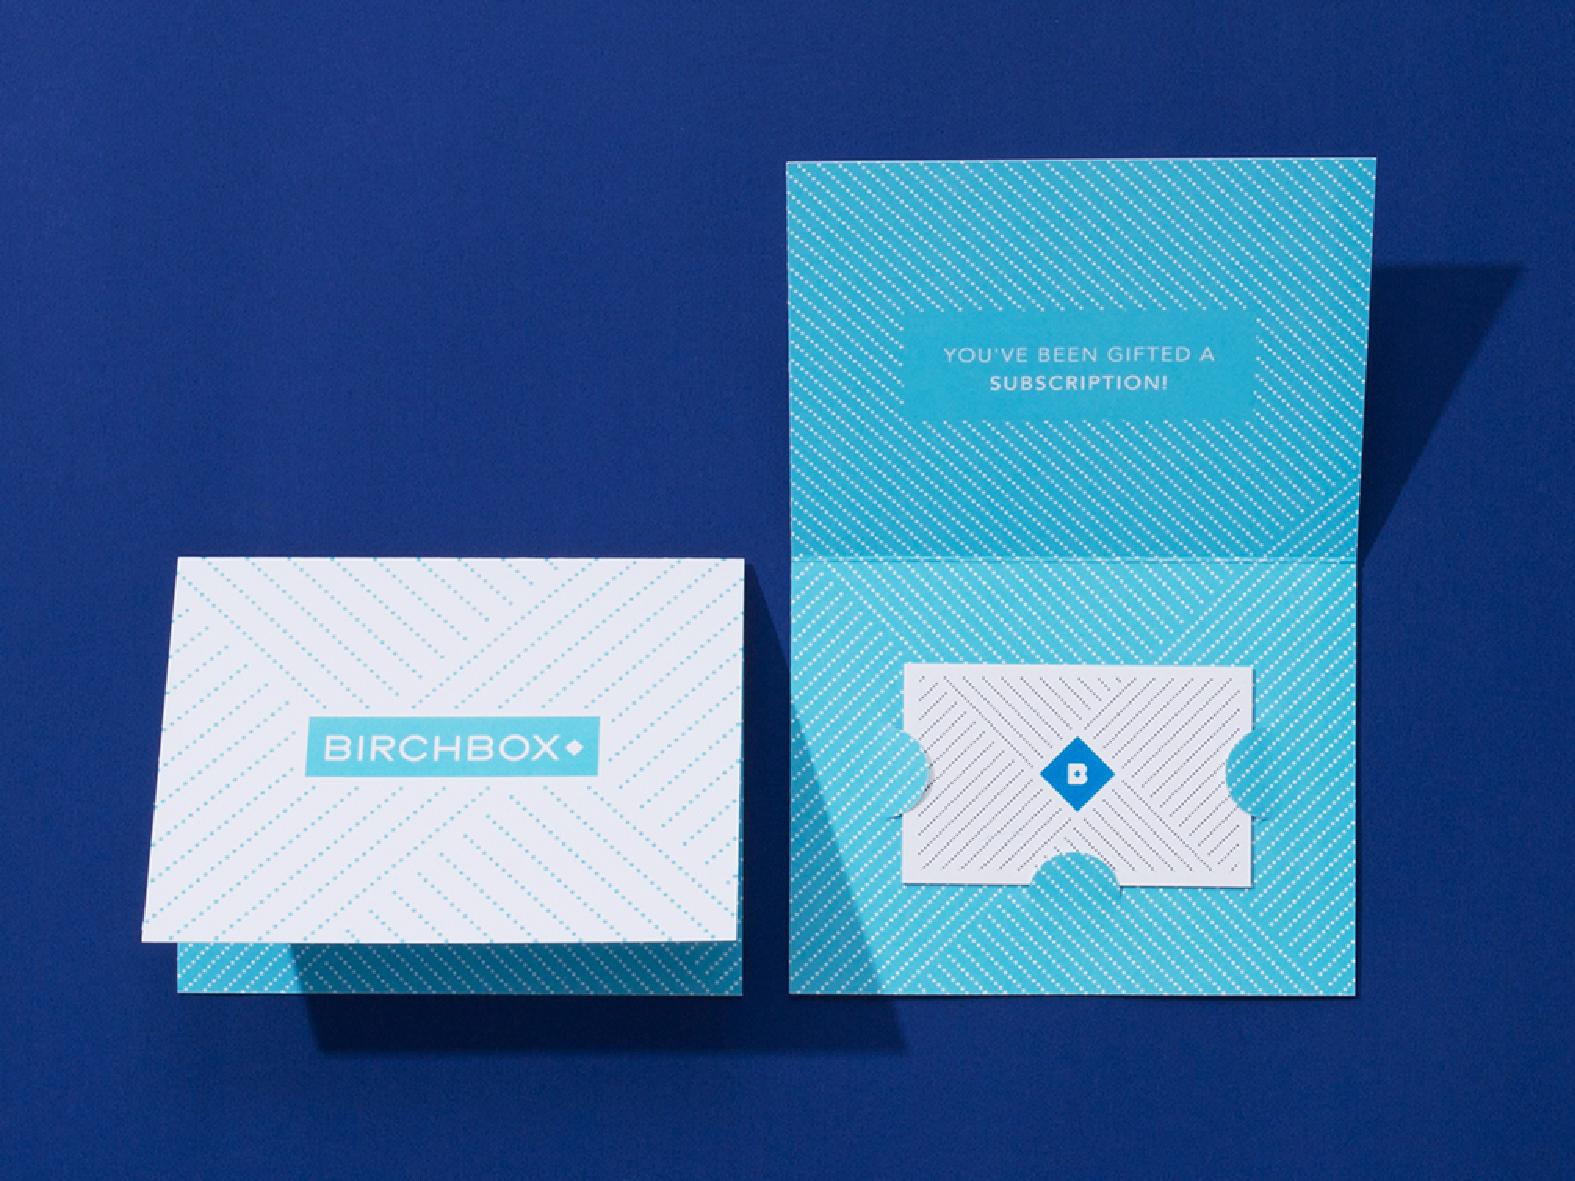 Birchbox holiday gift card print design gift card illustration packaging birchbox typography pattern design branding